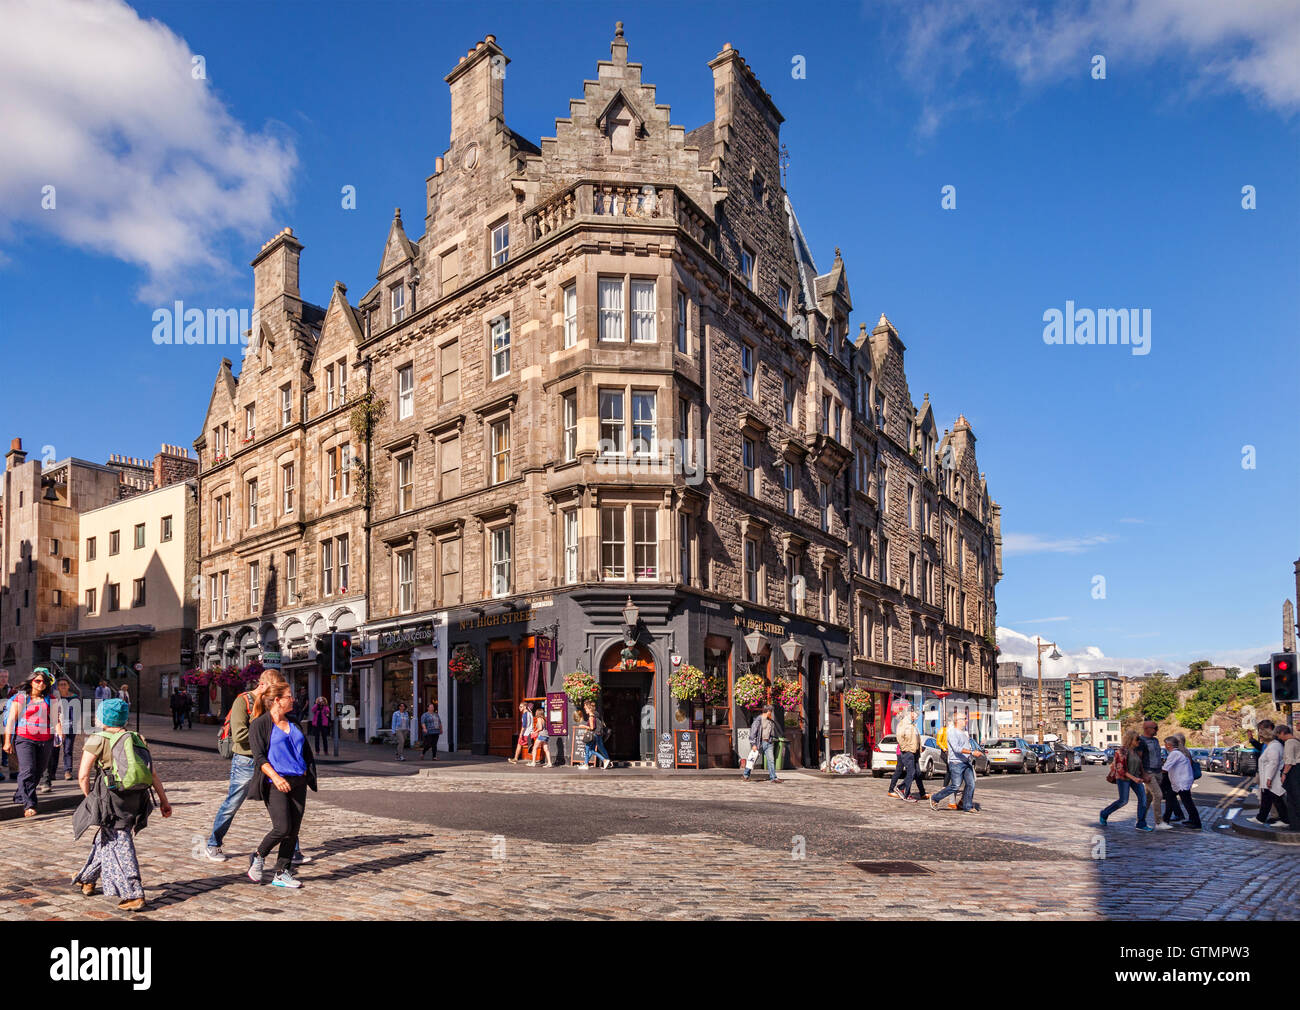 Pub in the Royal Mile, No. 1 High Street, on the corner of High Street and Jeffrey Street, Edinburgh, Scotland, - Stock Image